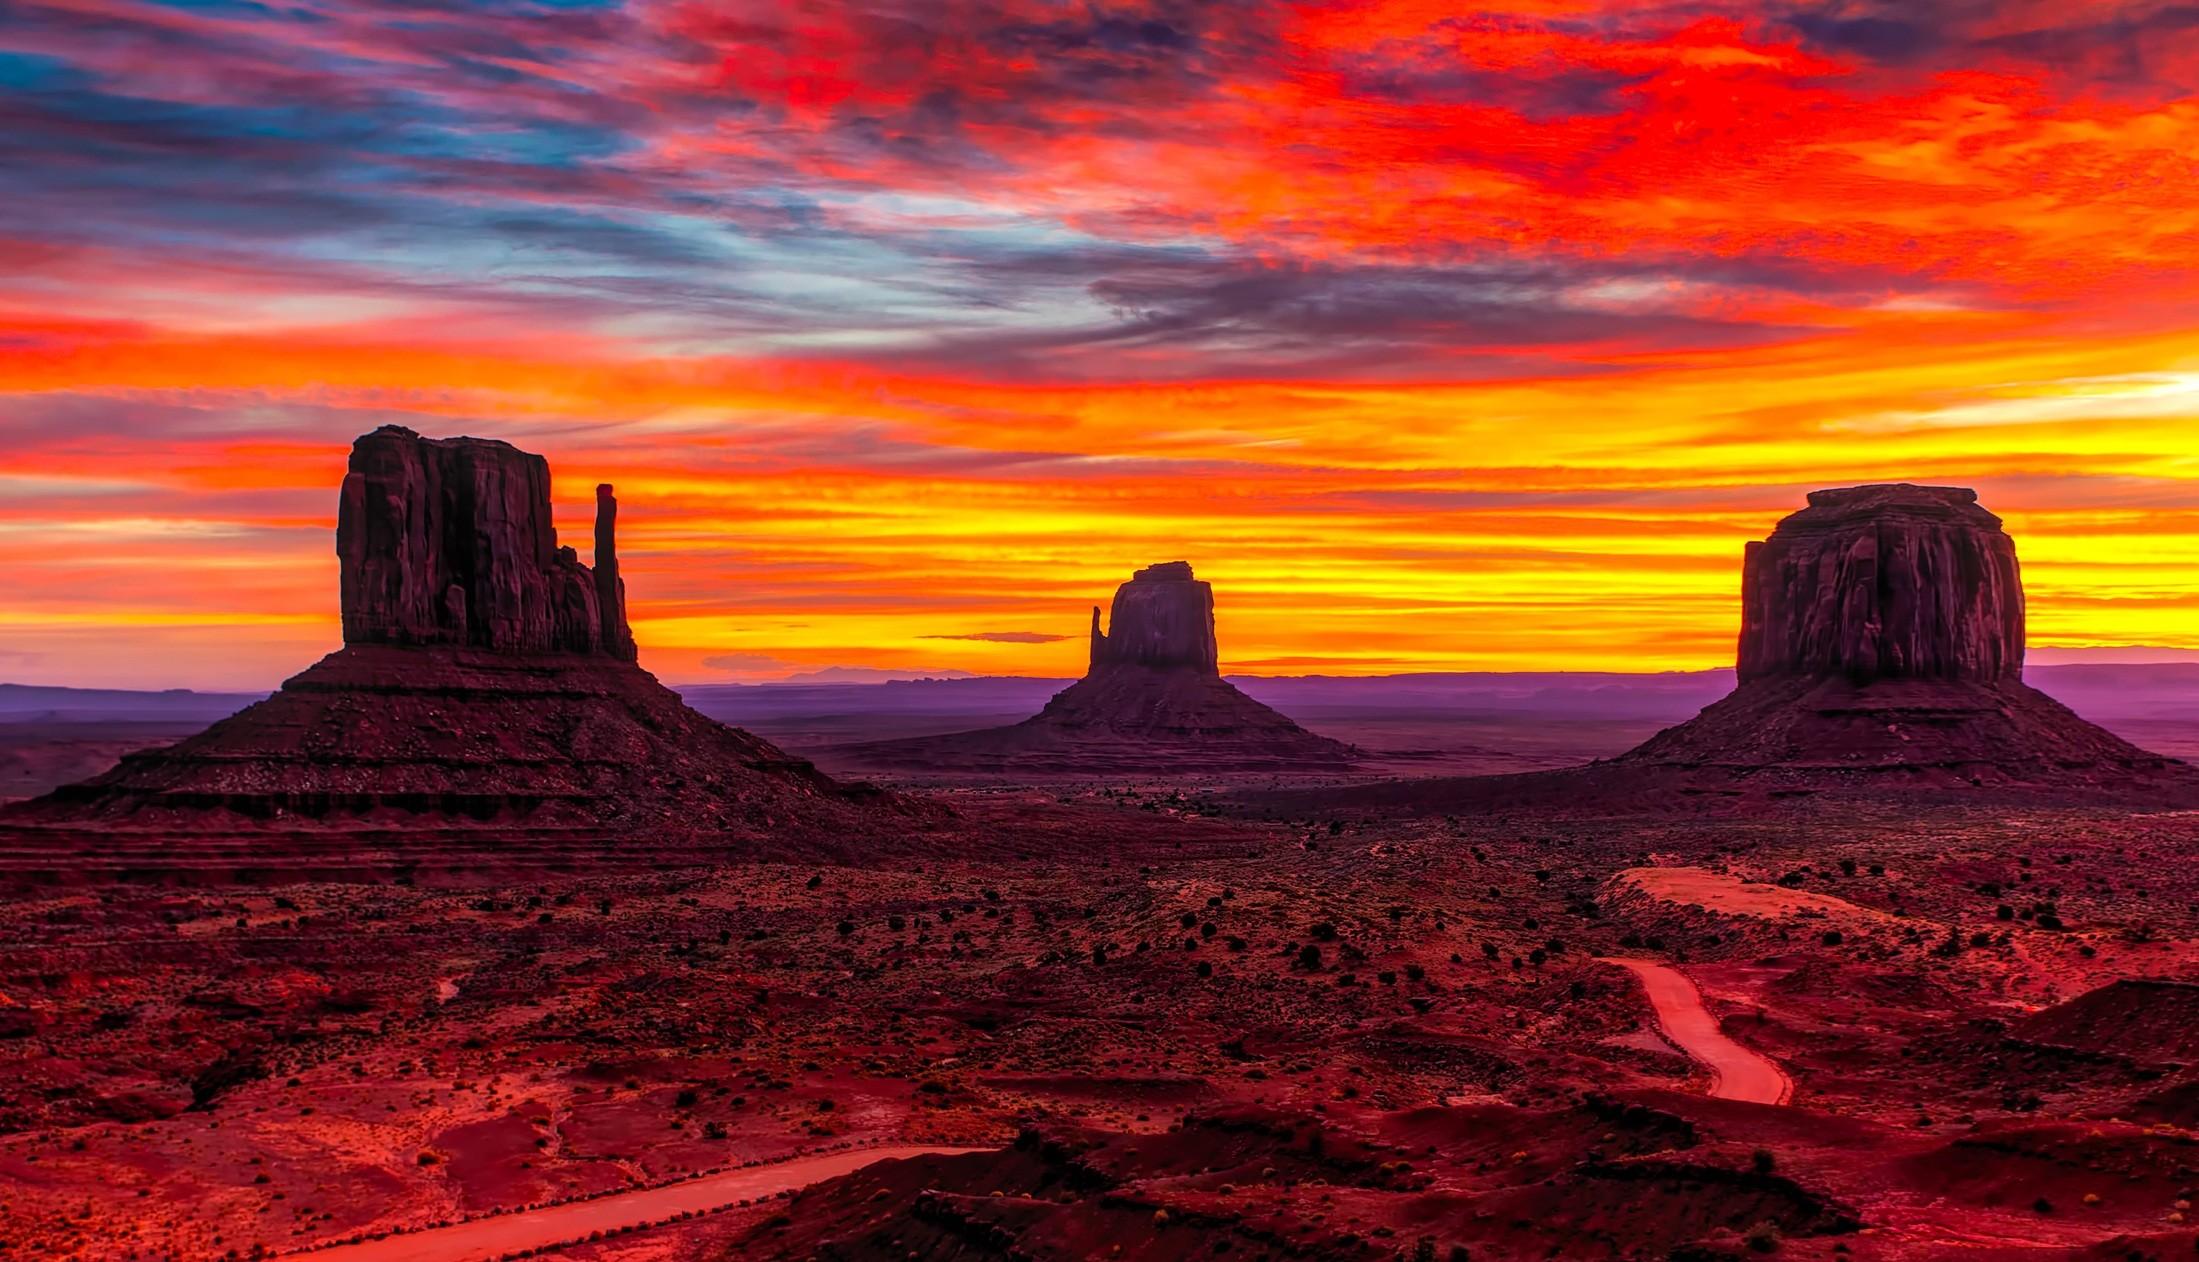 Arizona Sunset Wallpaper 52 Images